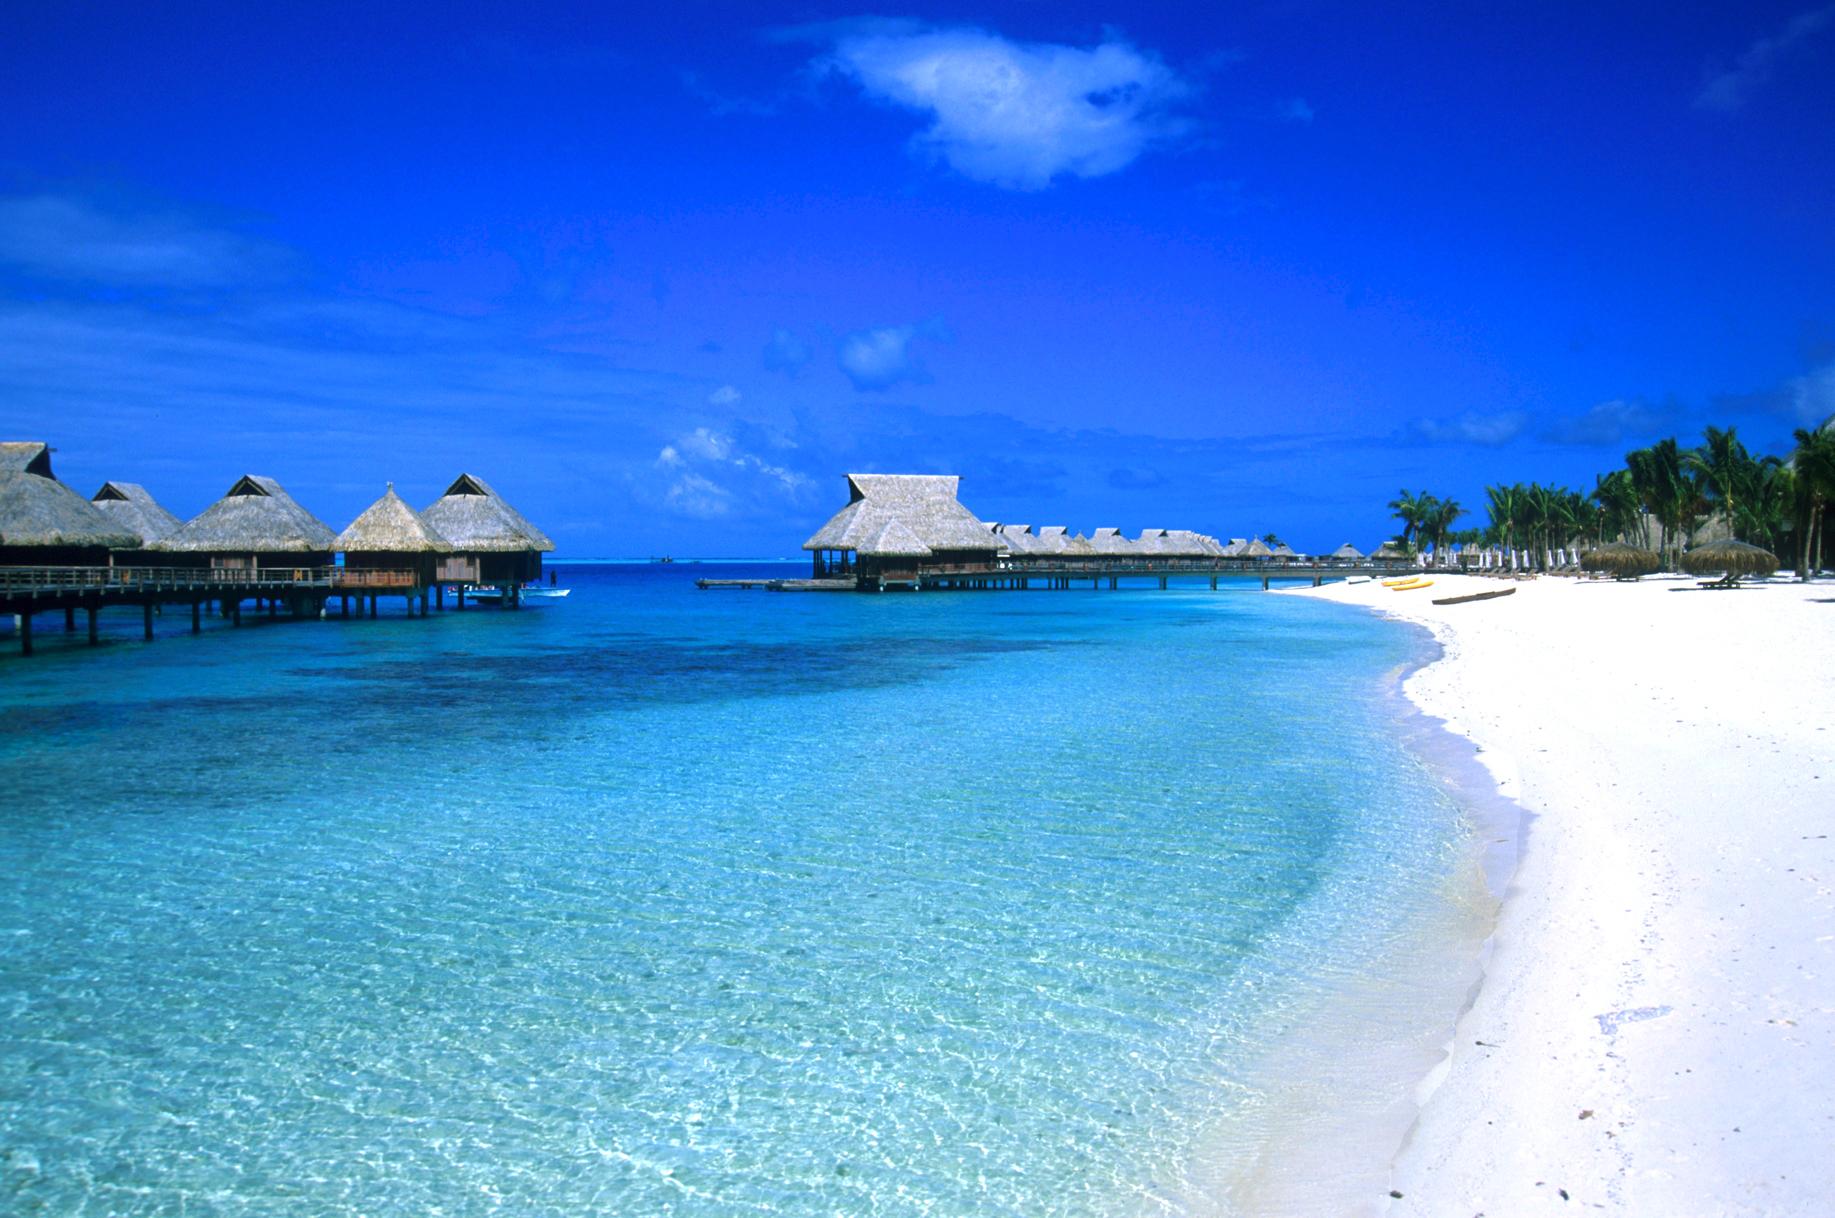 The most beautiful island in the world-Bora Bora